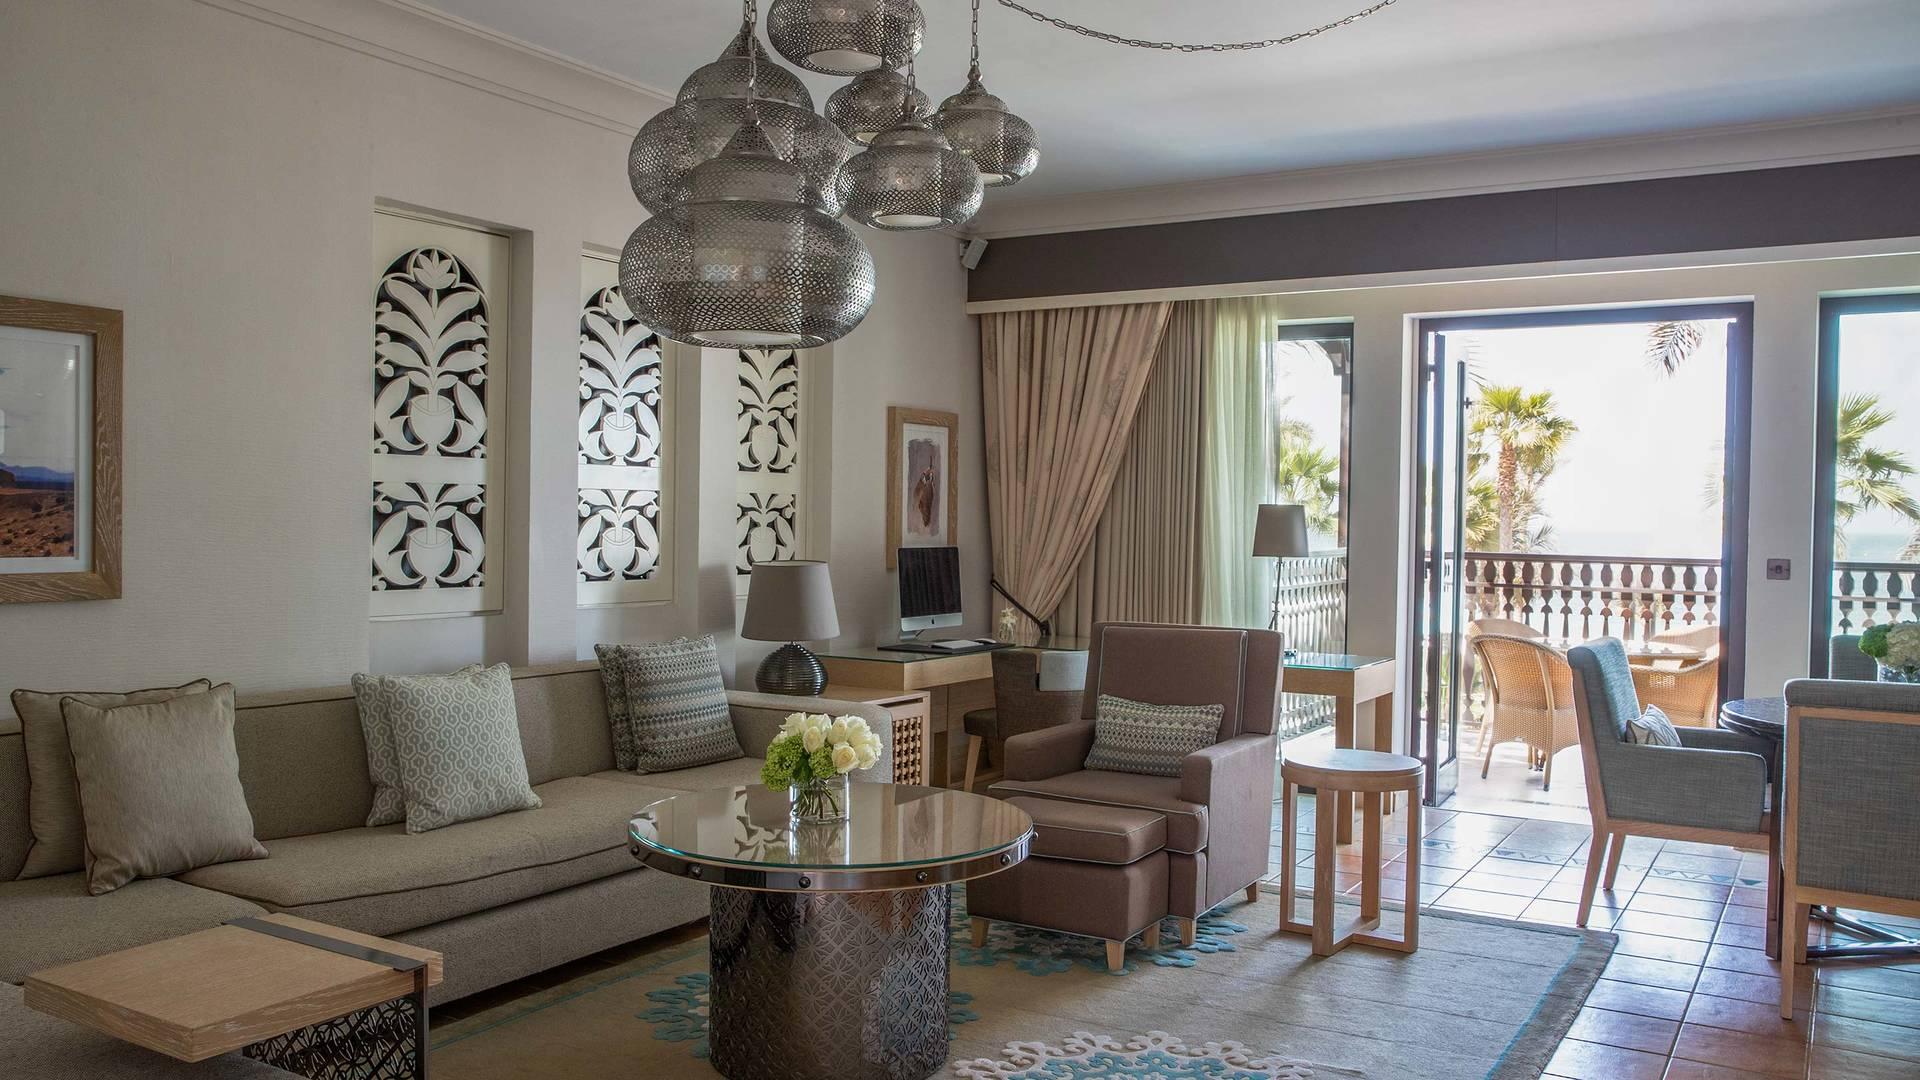 Jumeirah Dar Al Masyaf Gulf arabian suite livingroom_16-9